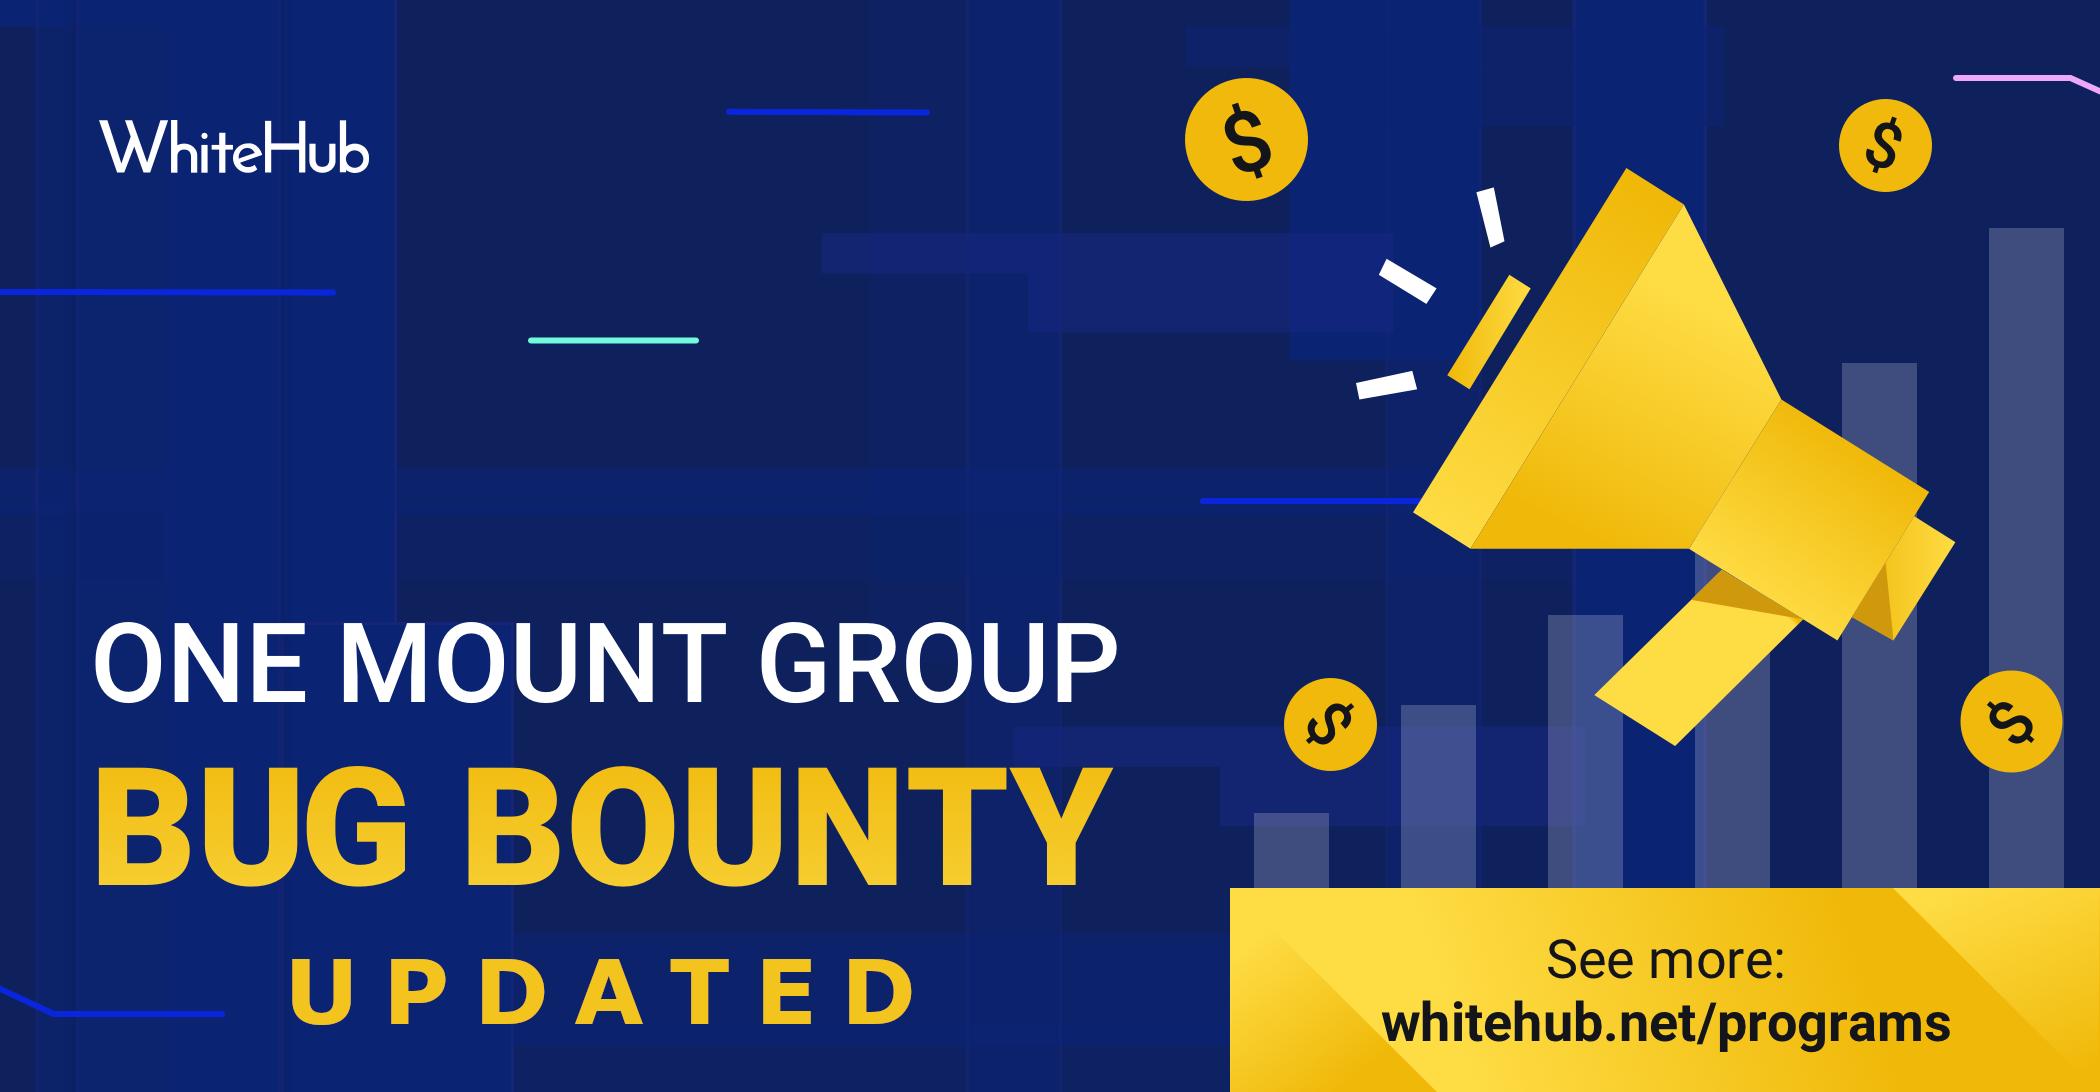 New updates for One Mount Group Bug Bounty program